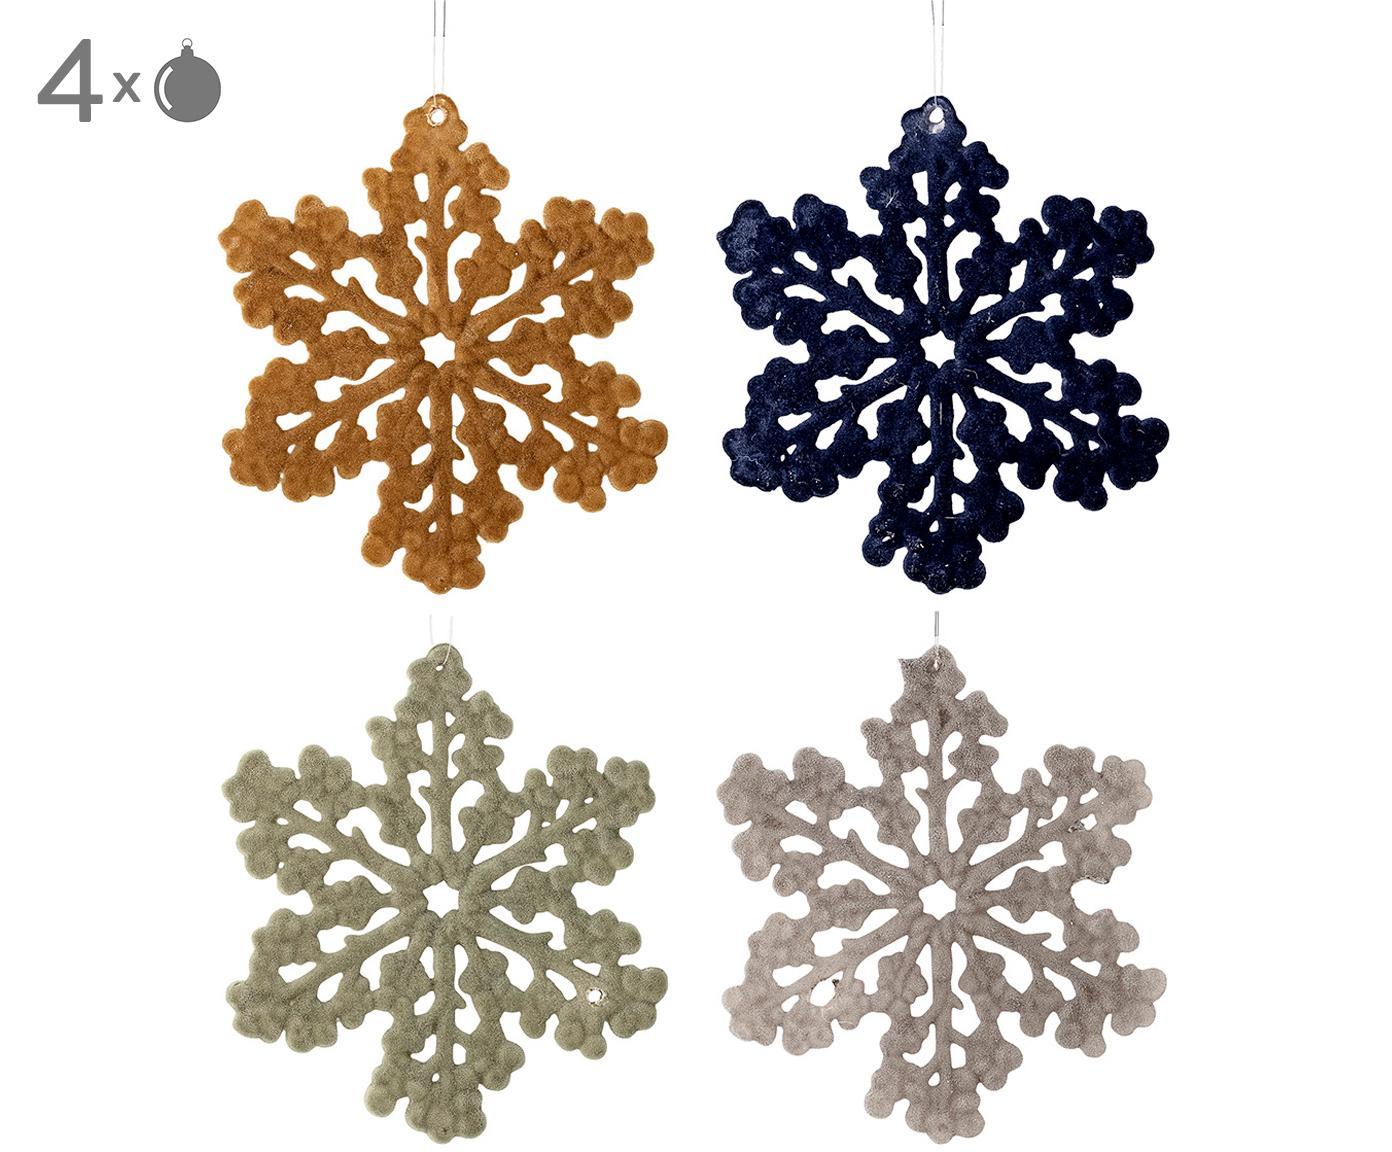 Baumanhänger-Set Snowflakes, 4-tlg., Polypropylen, Polyester, Senfgelb, Dunkelblau, Mintgrün, Grau, Ø 12 cm